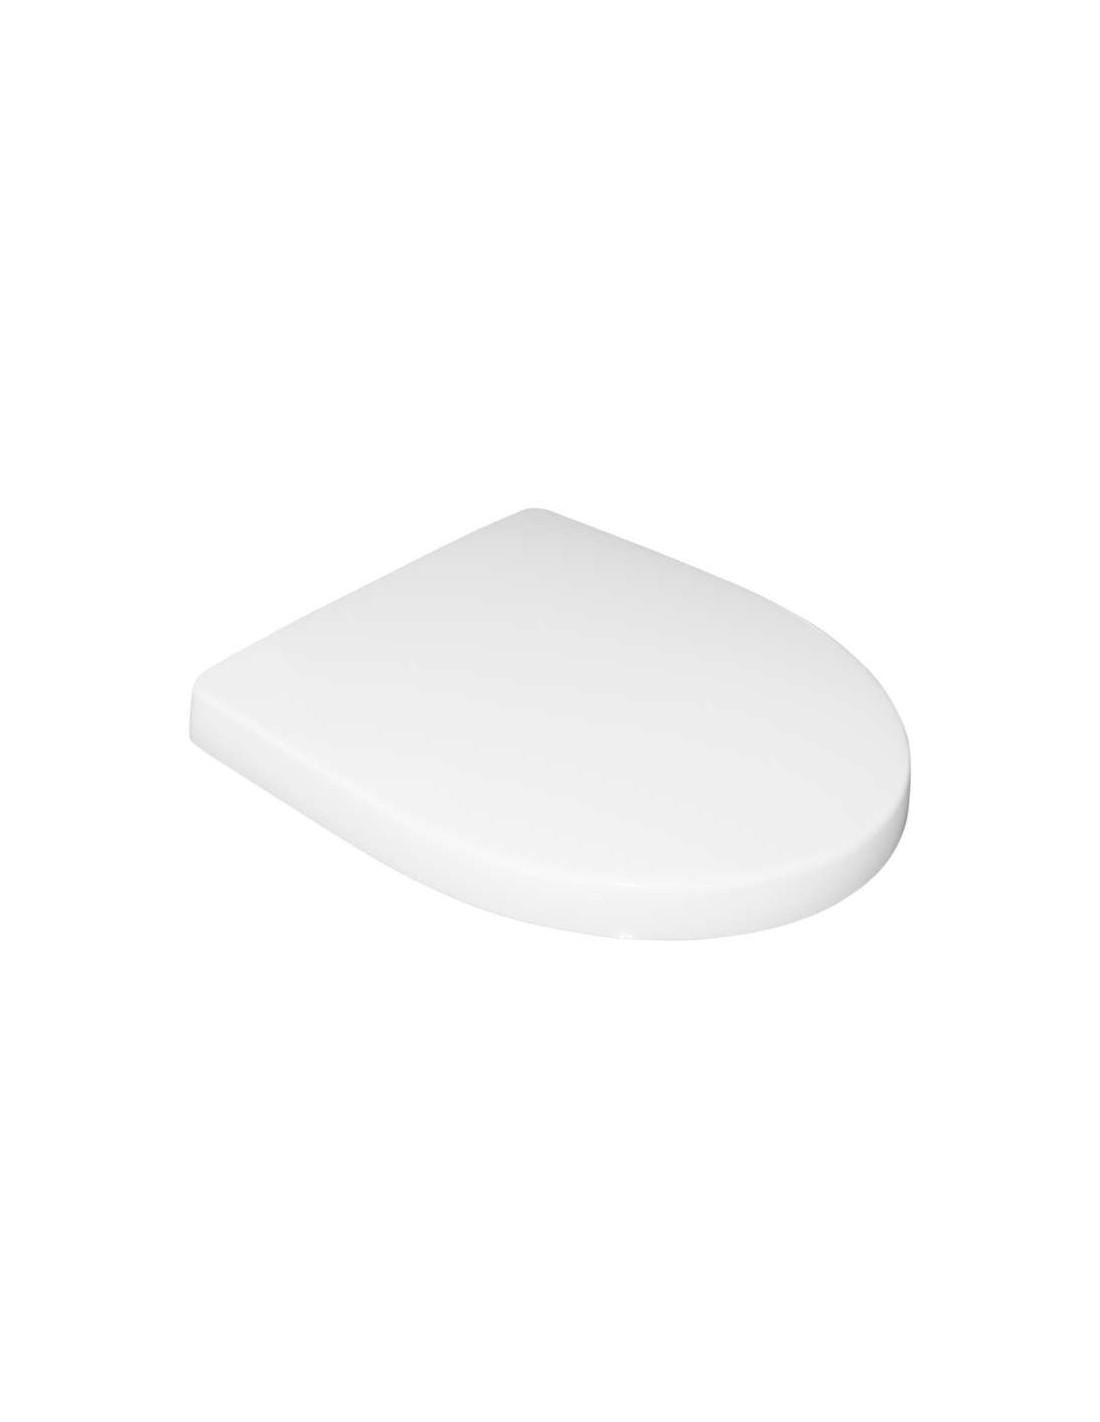 toilet seat jacob delafon odeon up panache. Black Bedroom Furniture Sets. Home Design Ideas